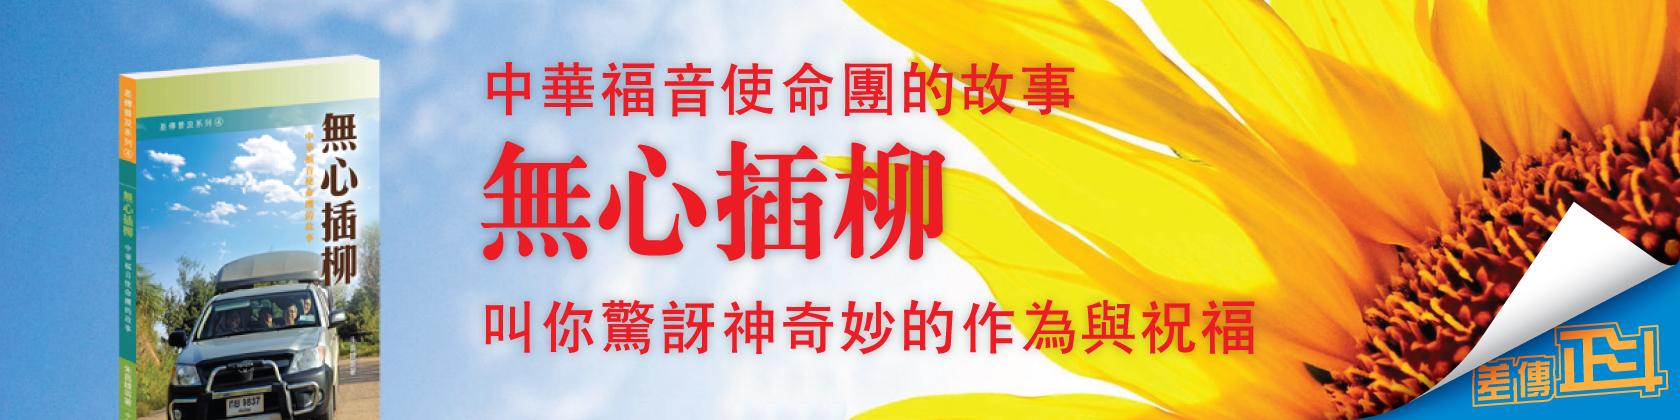 CB-01-web-banner-1680-x-420-B1-06